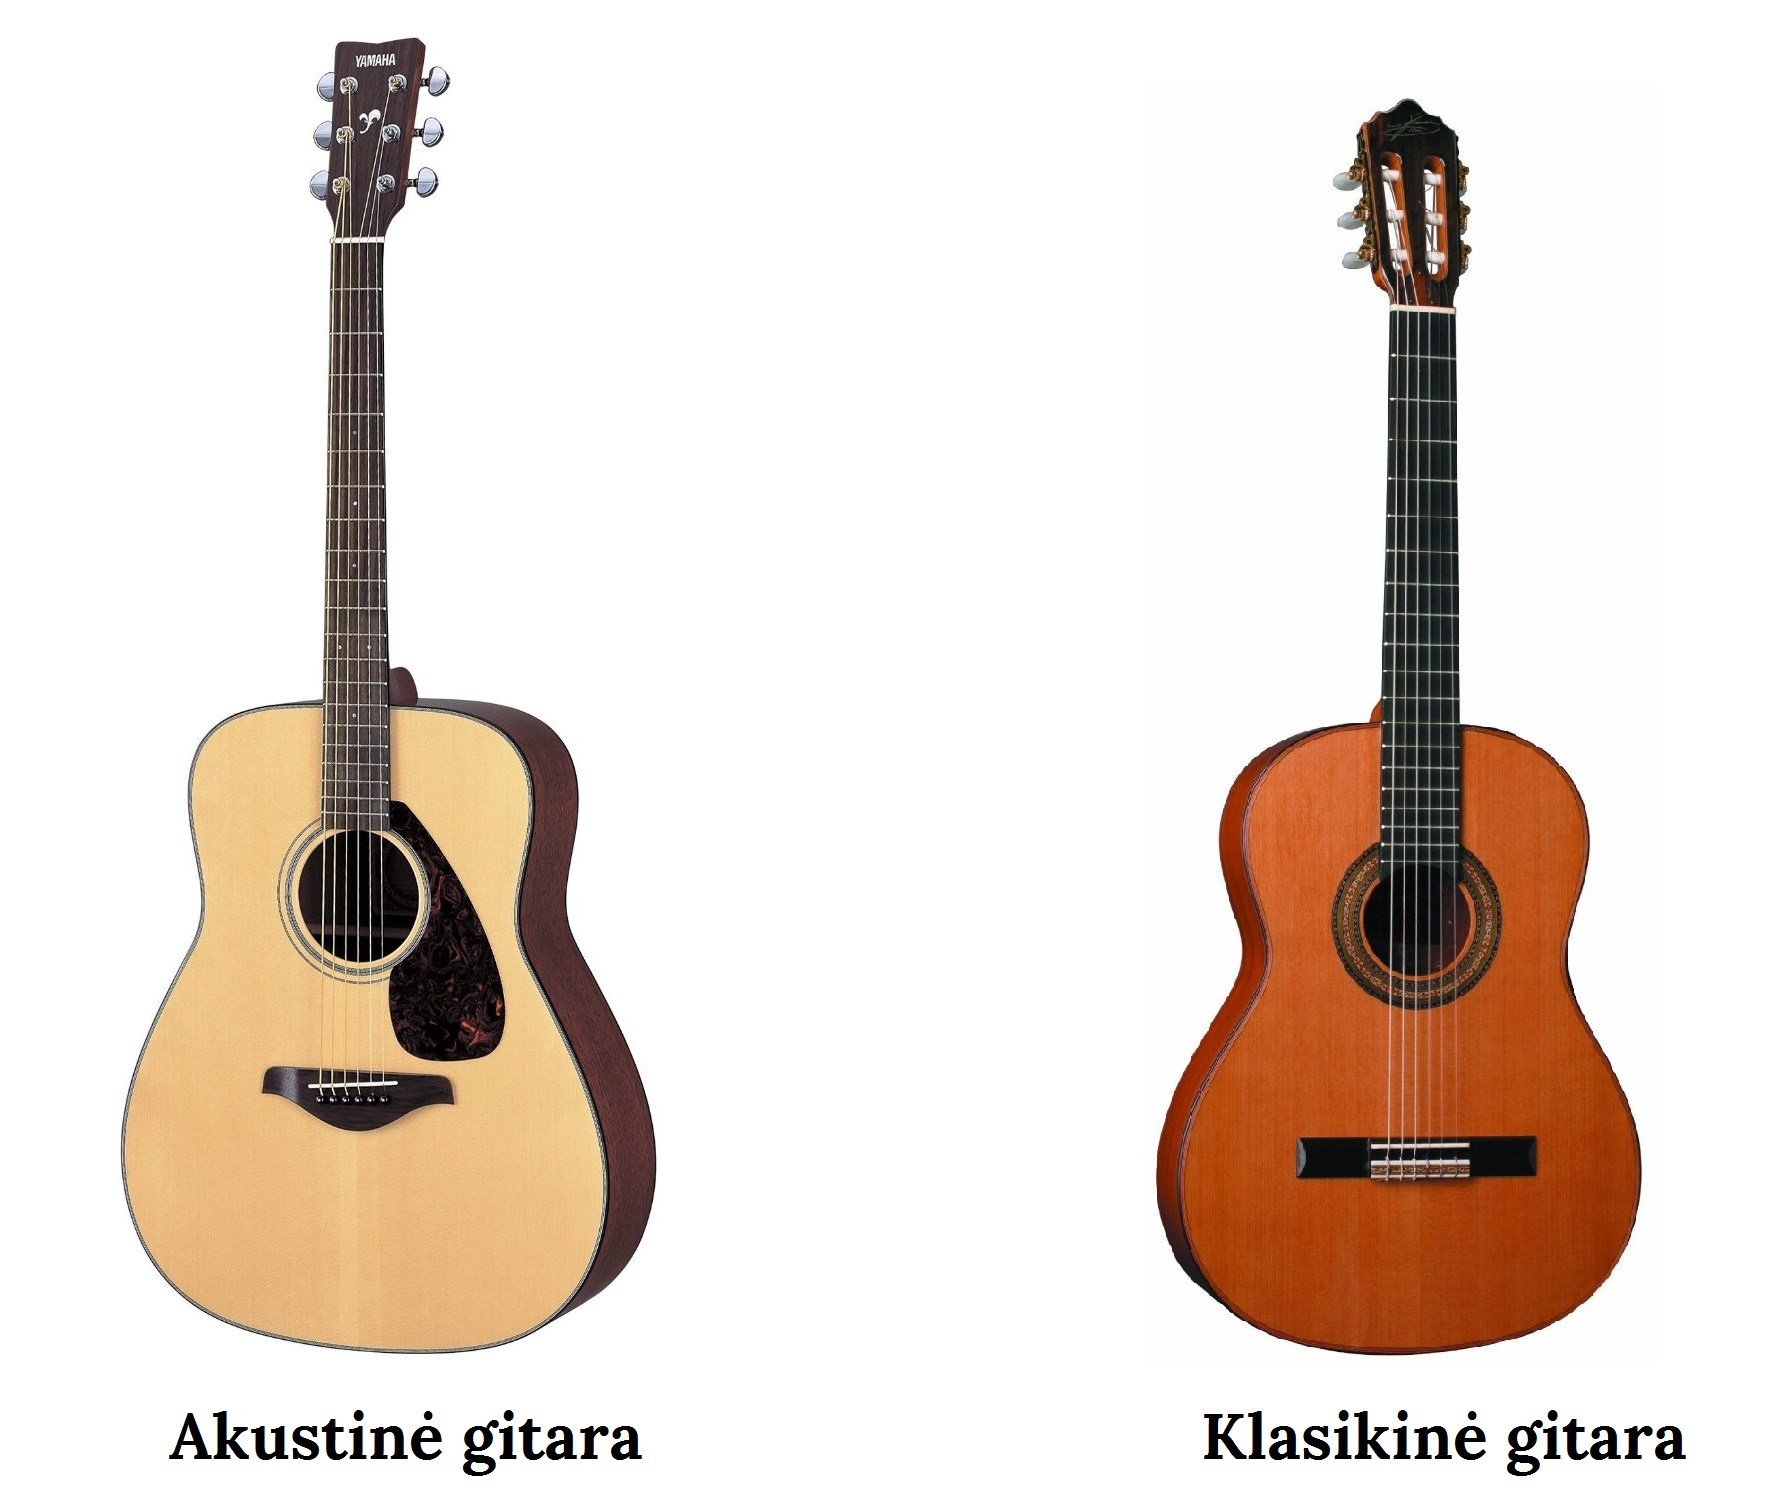 Akustine ir klasikine gitara